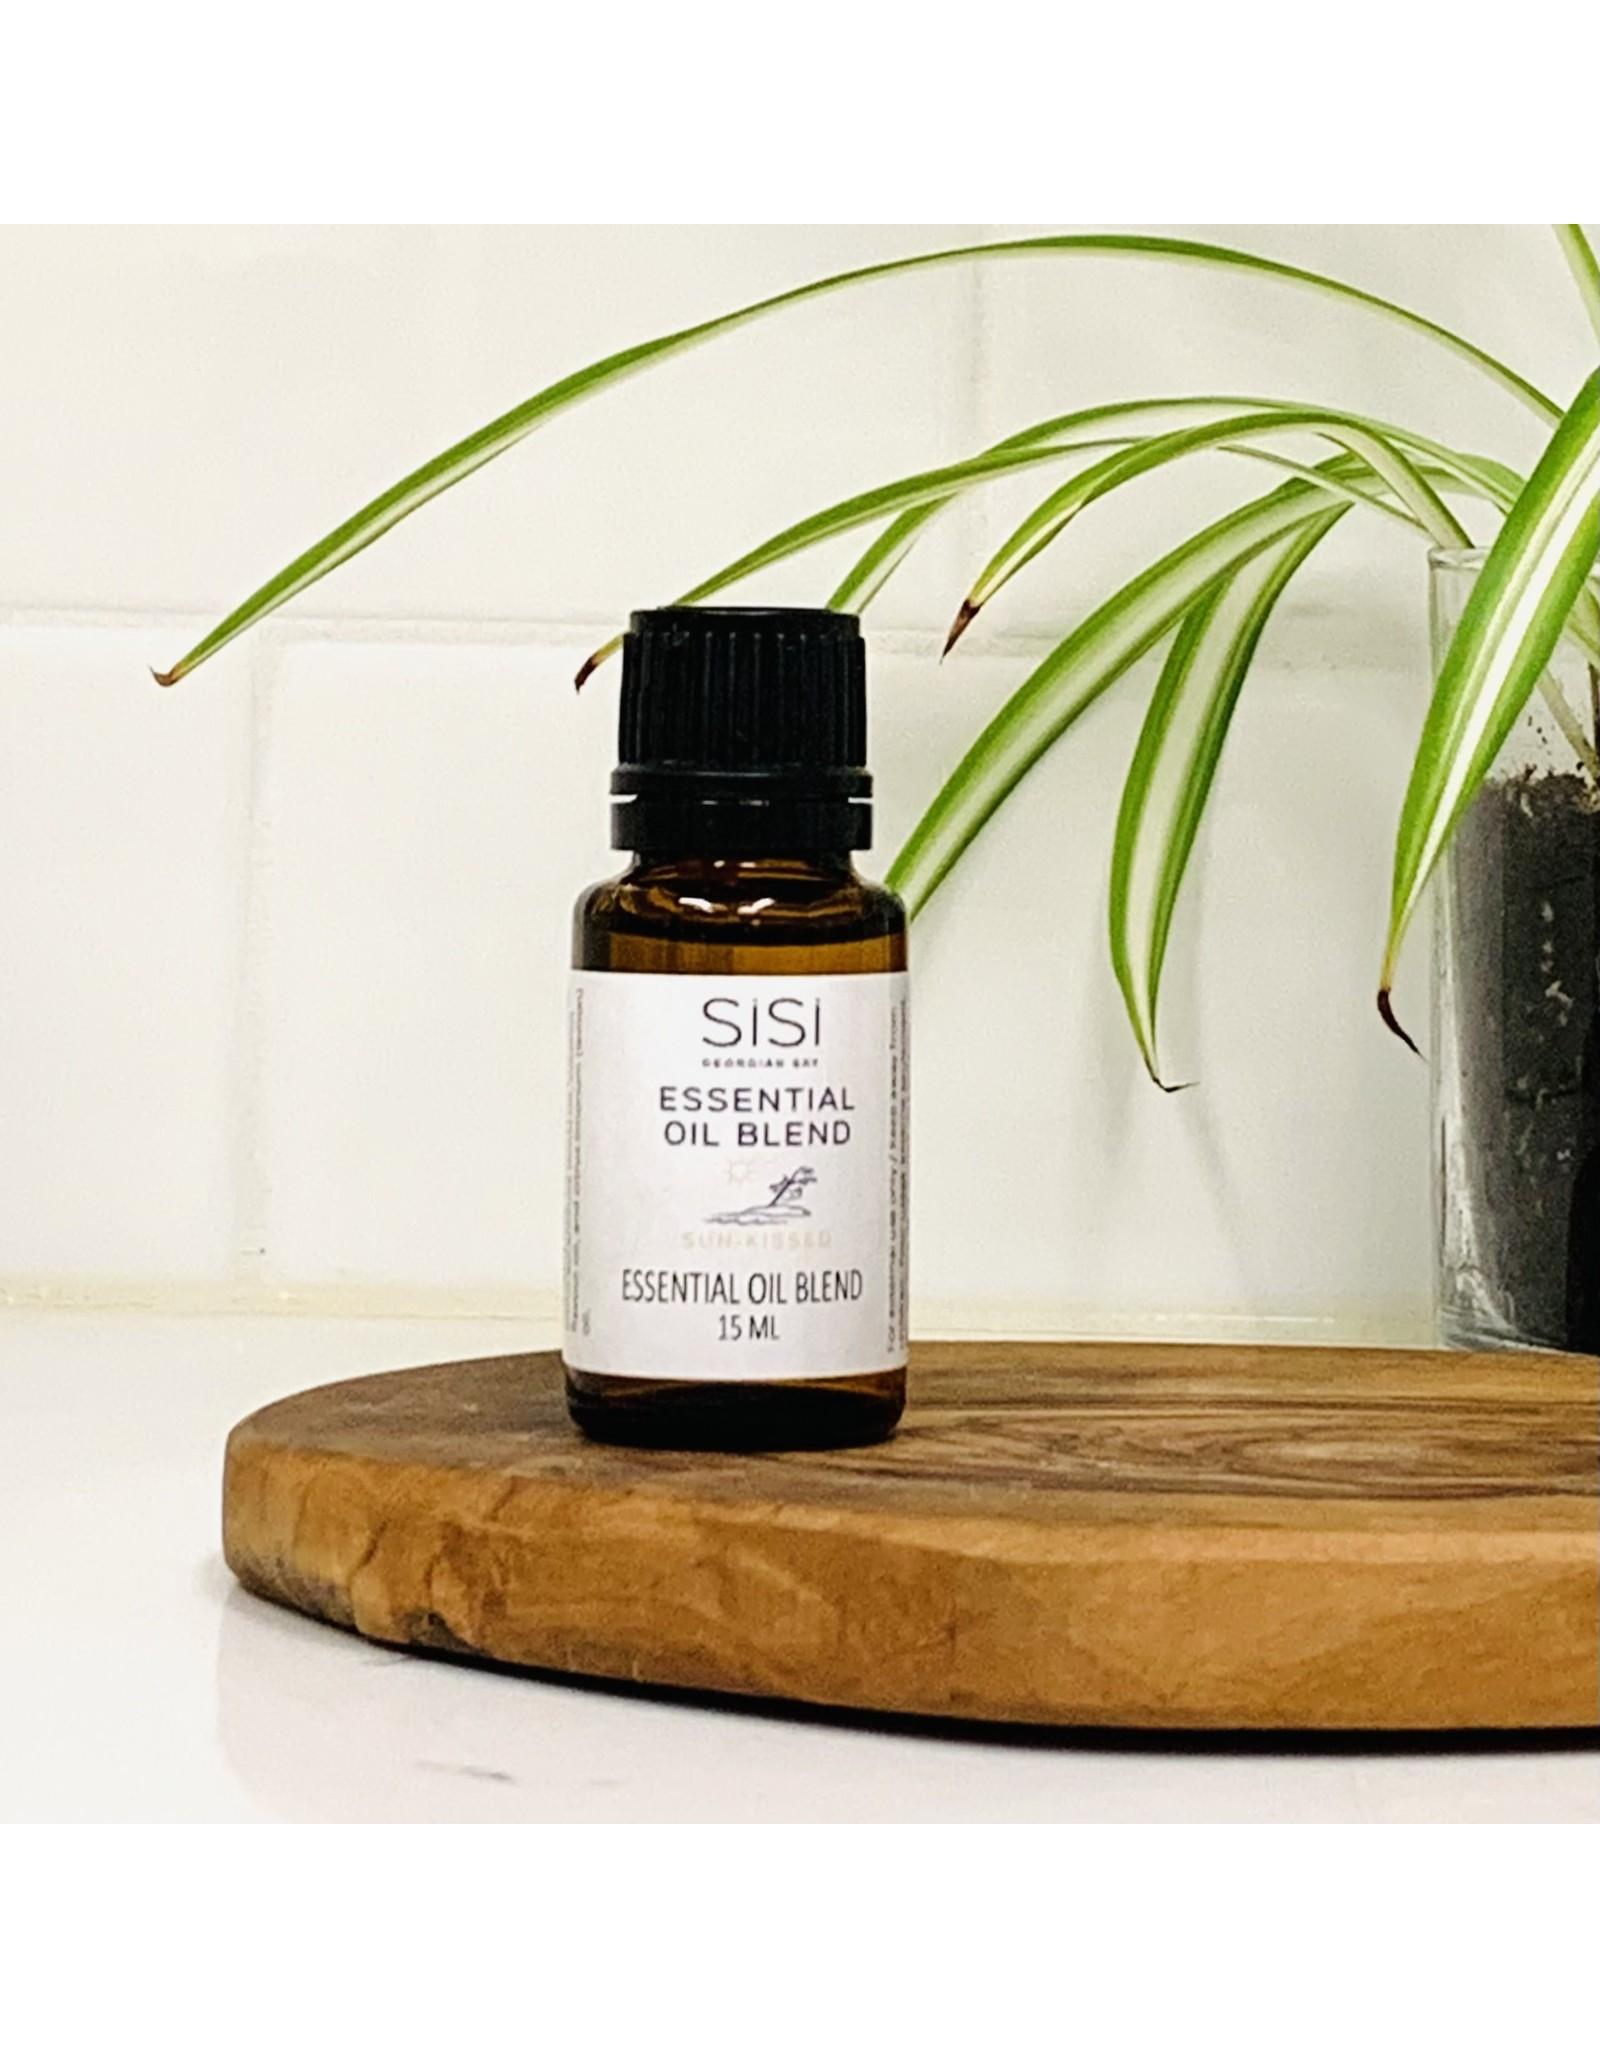 SiSi Georgian Bay Aromatherapy Essential Oil Blend